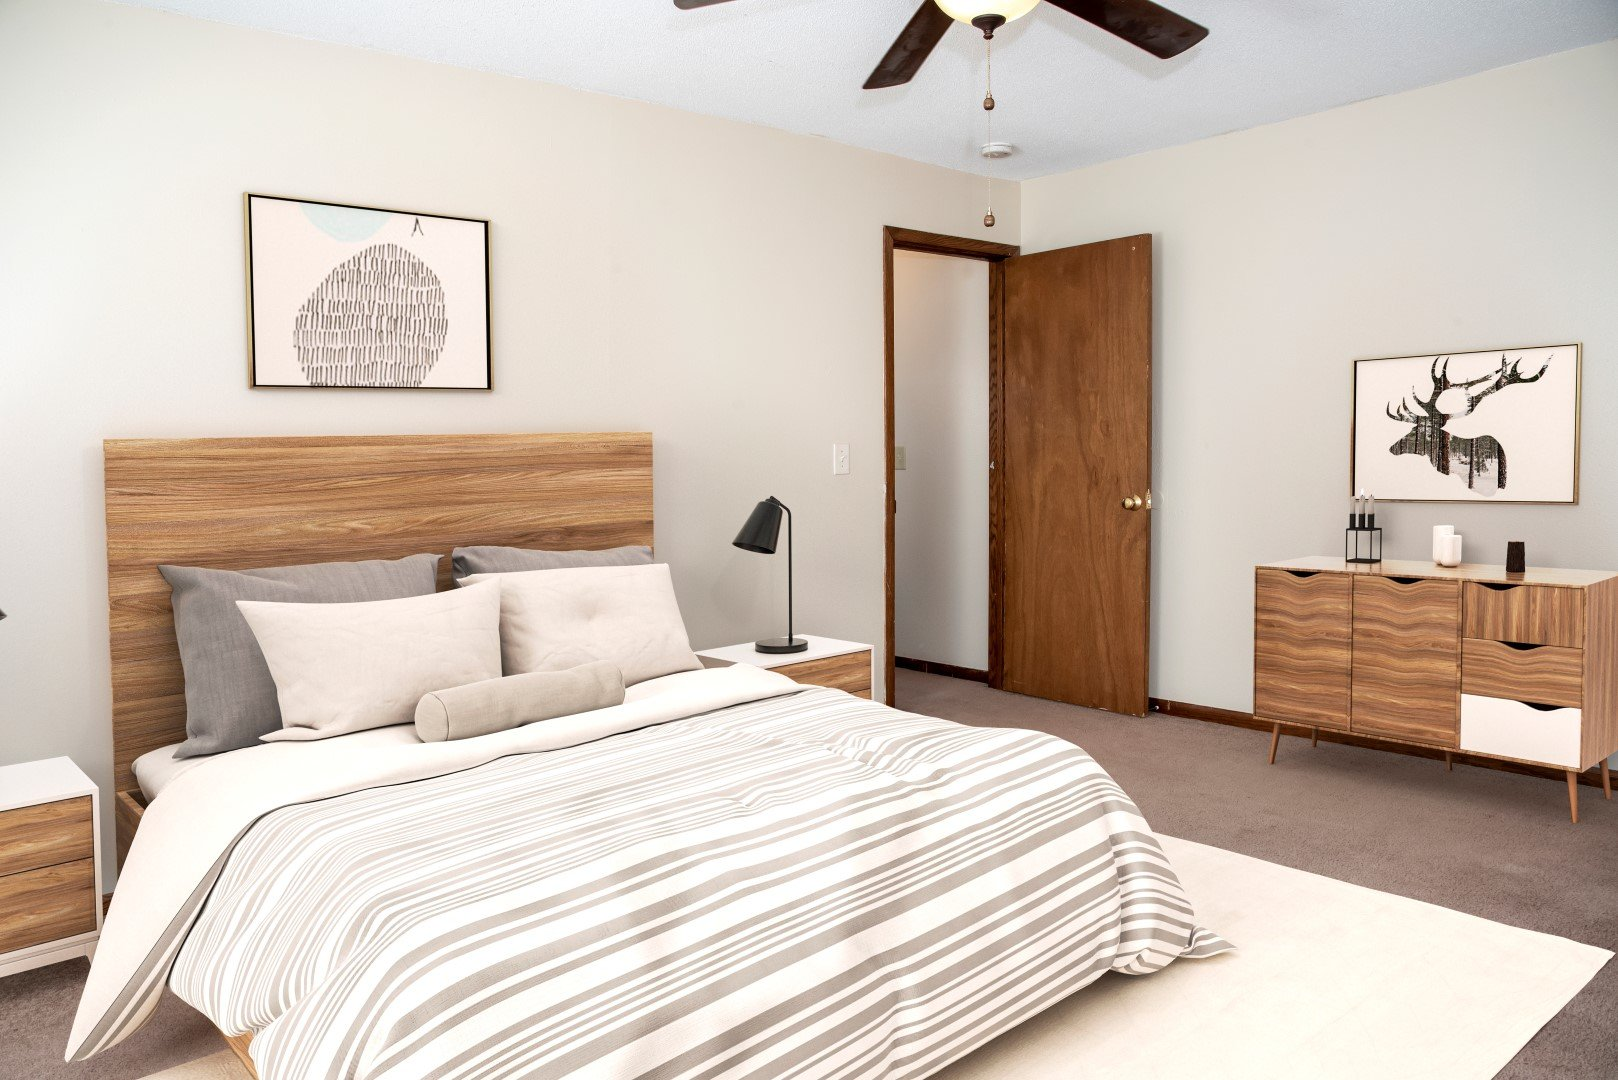 Bass Lake Crossing large bedroom